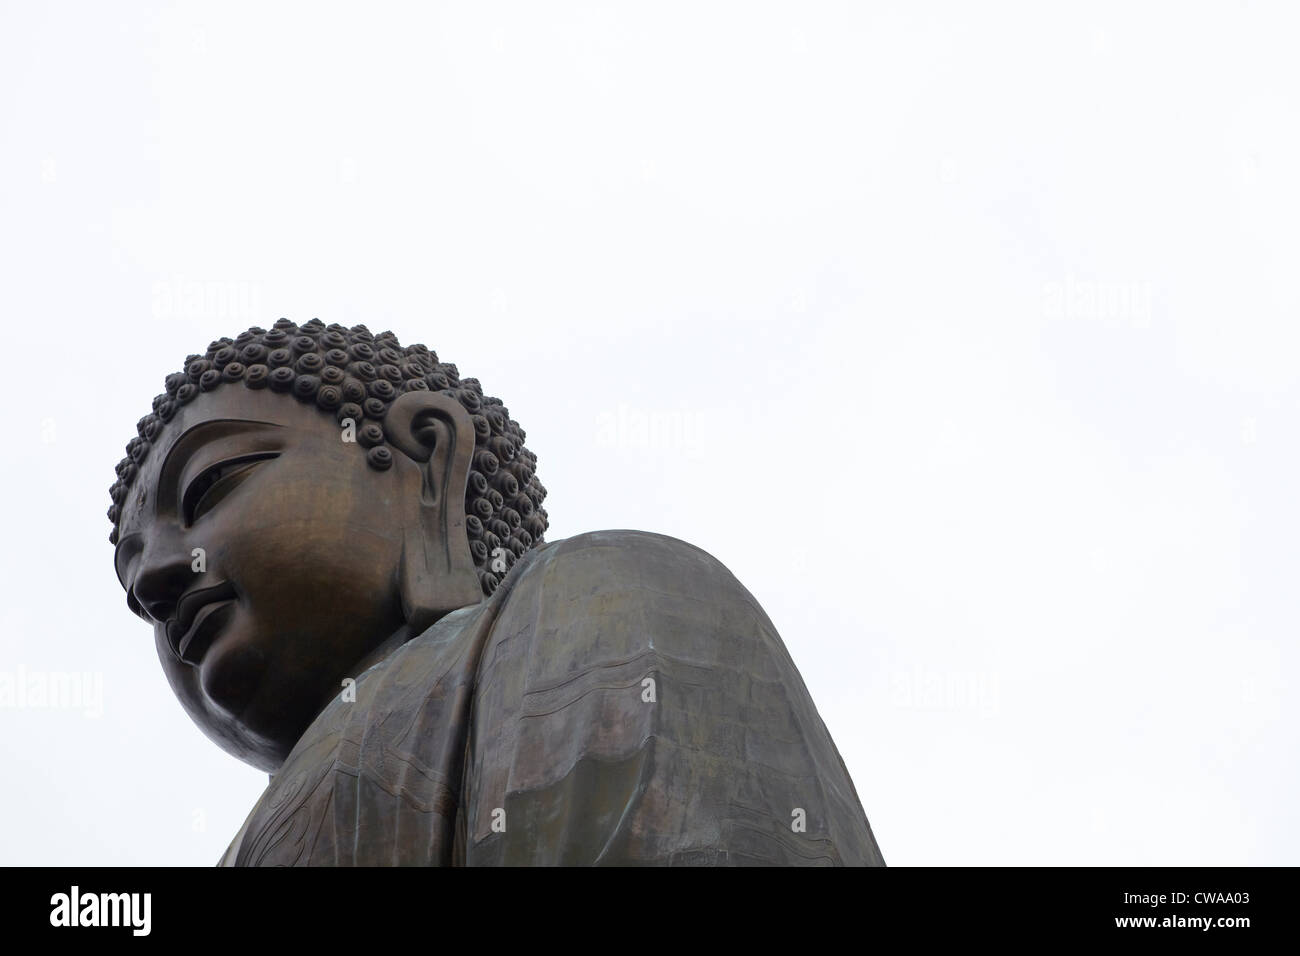 Tian tan buddha, hong kong, china - Stock Image